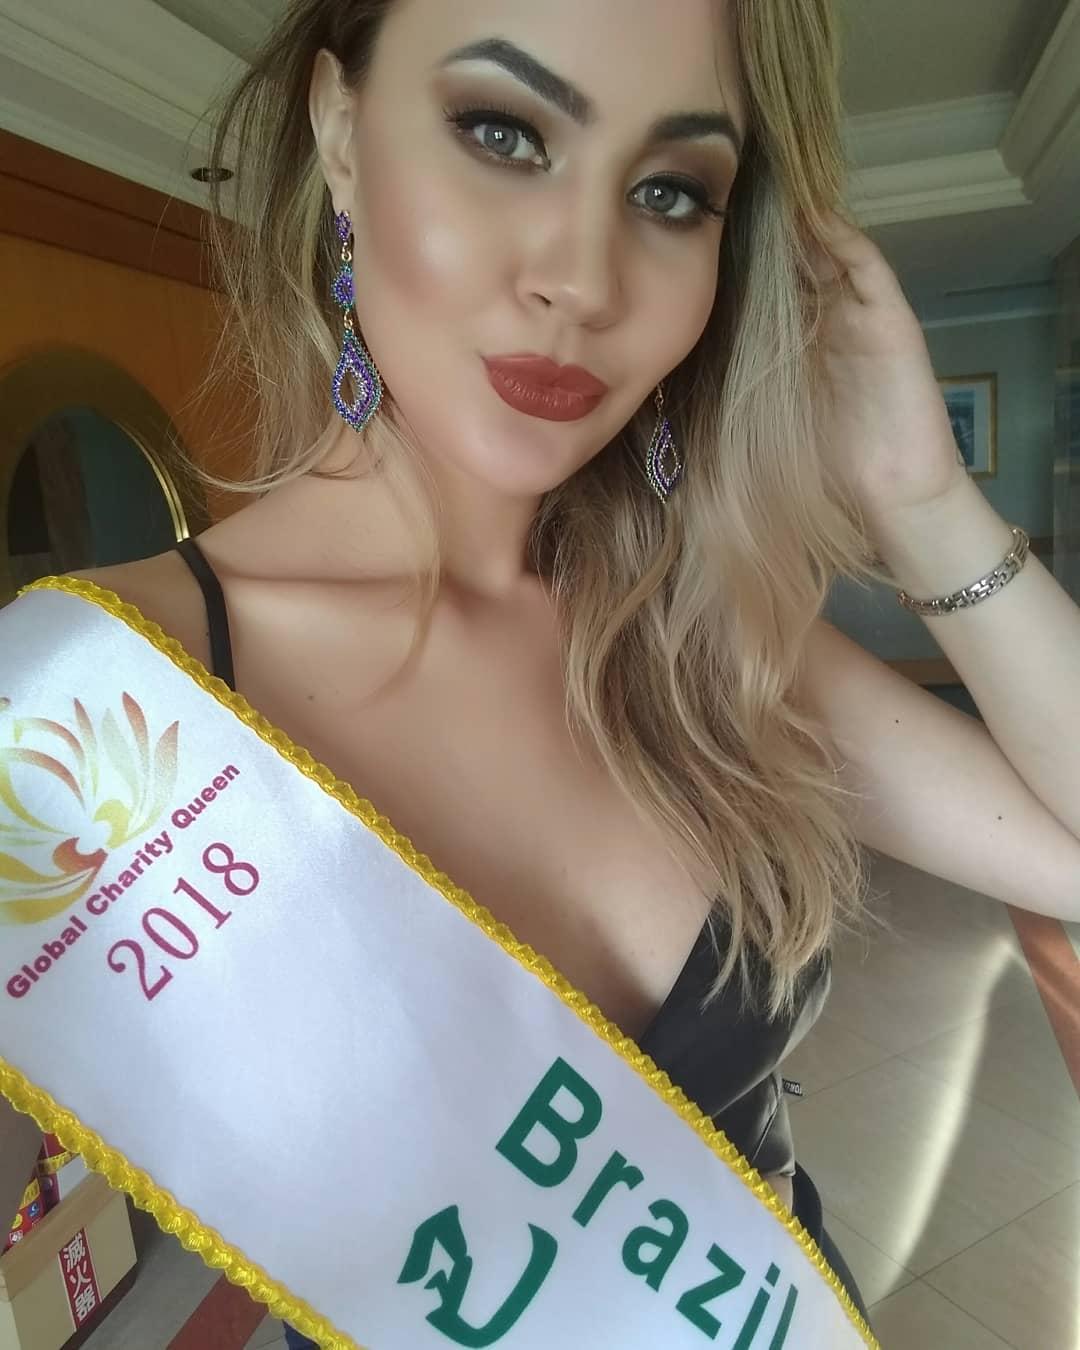 sabrina soares da silva, global charity queen brazil 2018. 41514211